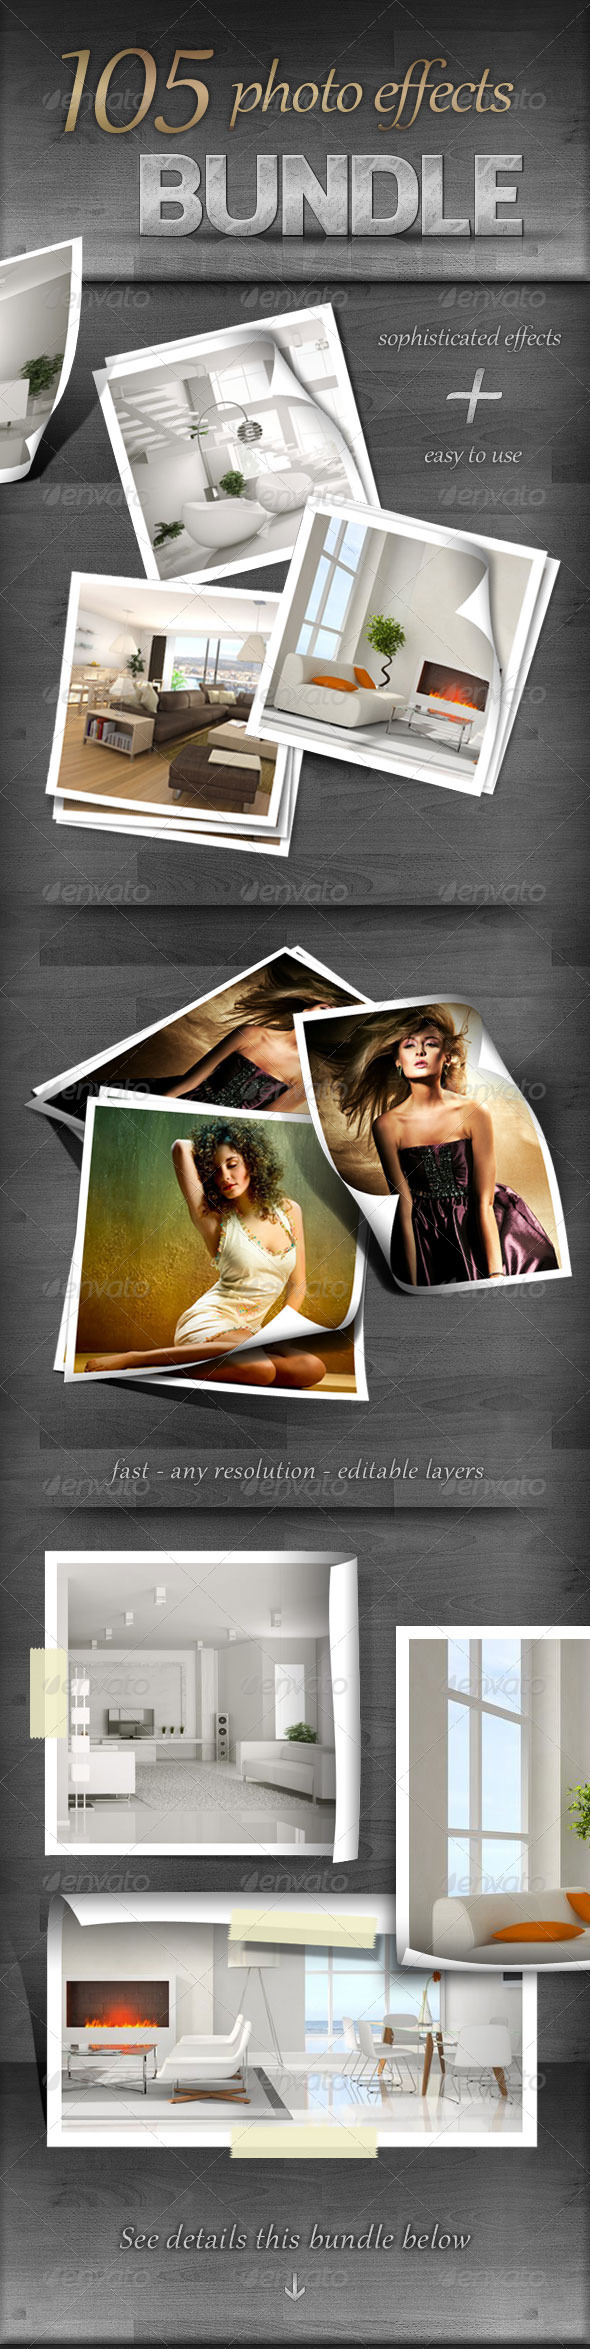 GraphicRiver 105 Photo Effects Bundle 723542